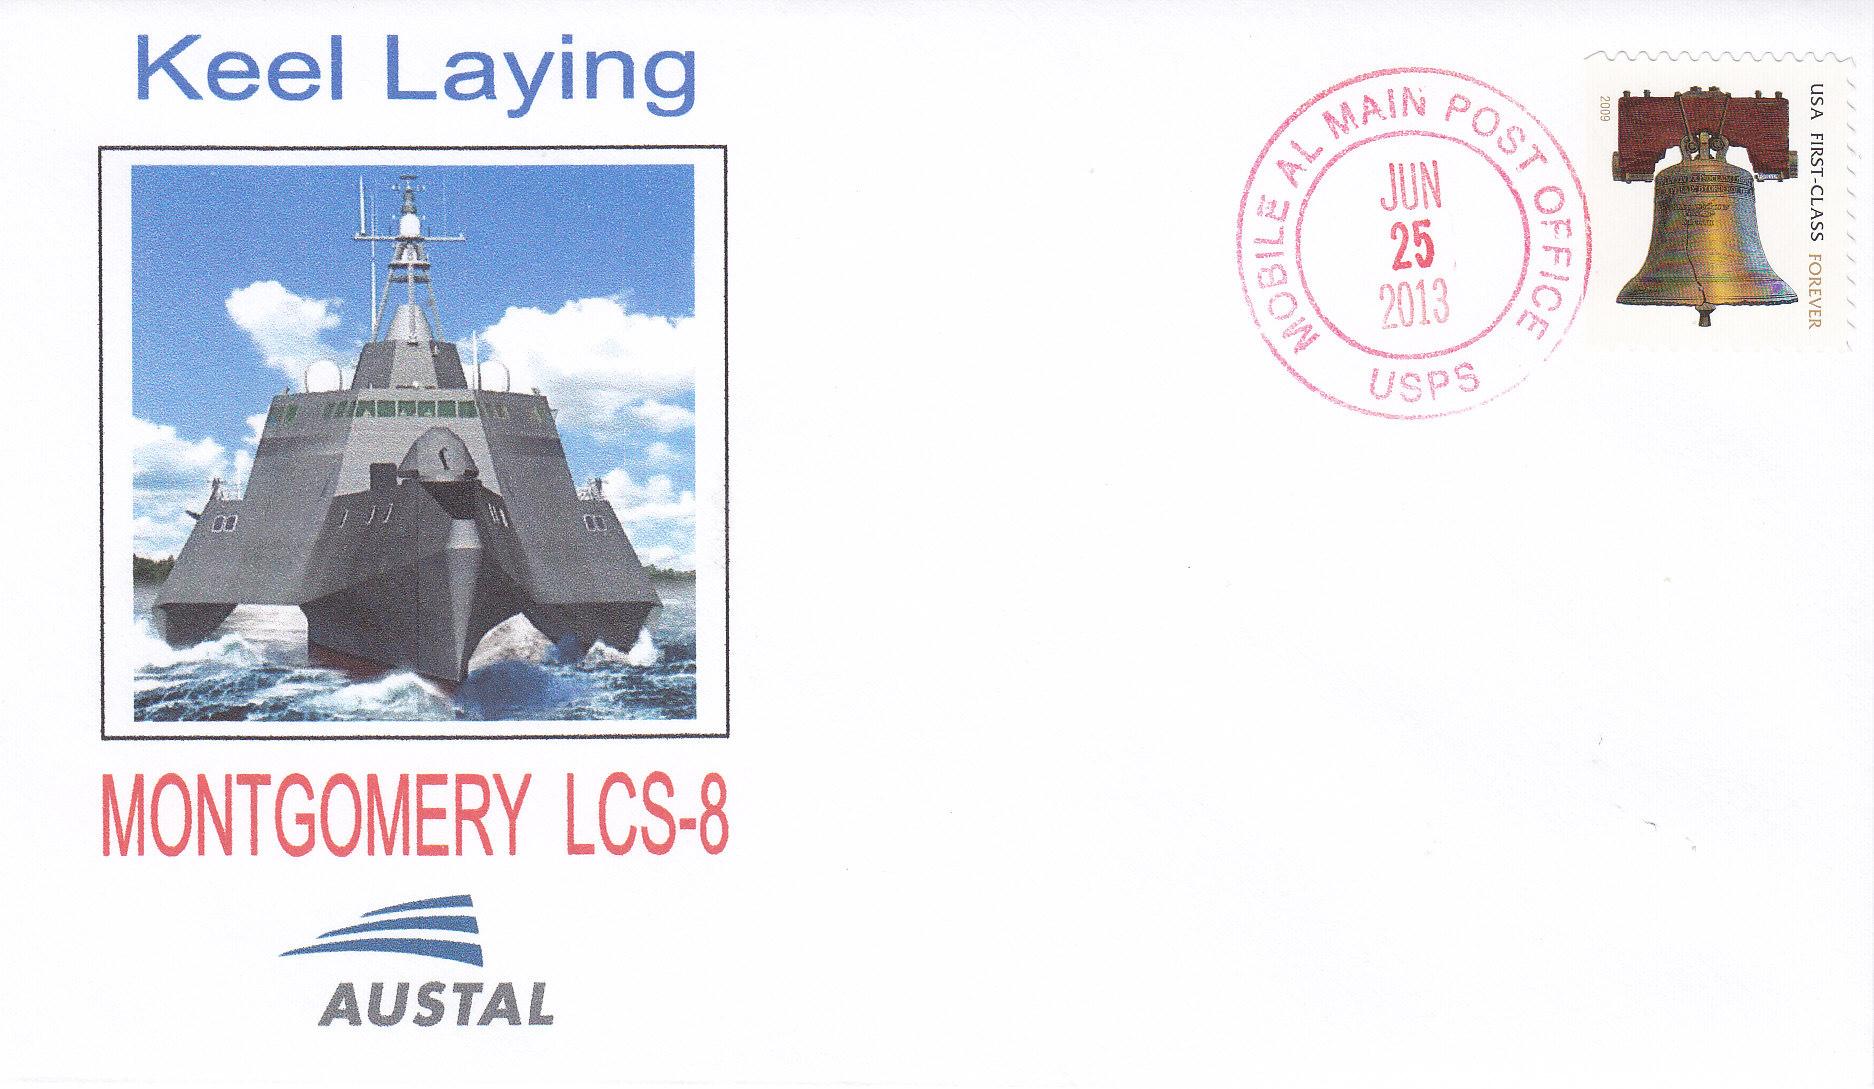 Beleg USS MONTGOMERY LCS-8 Kiellegung